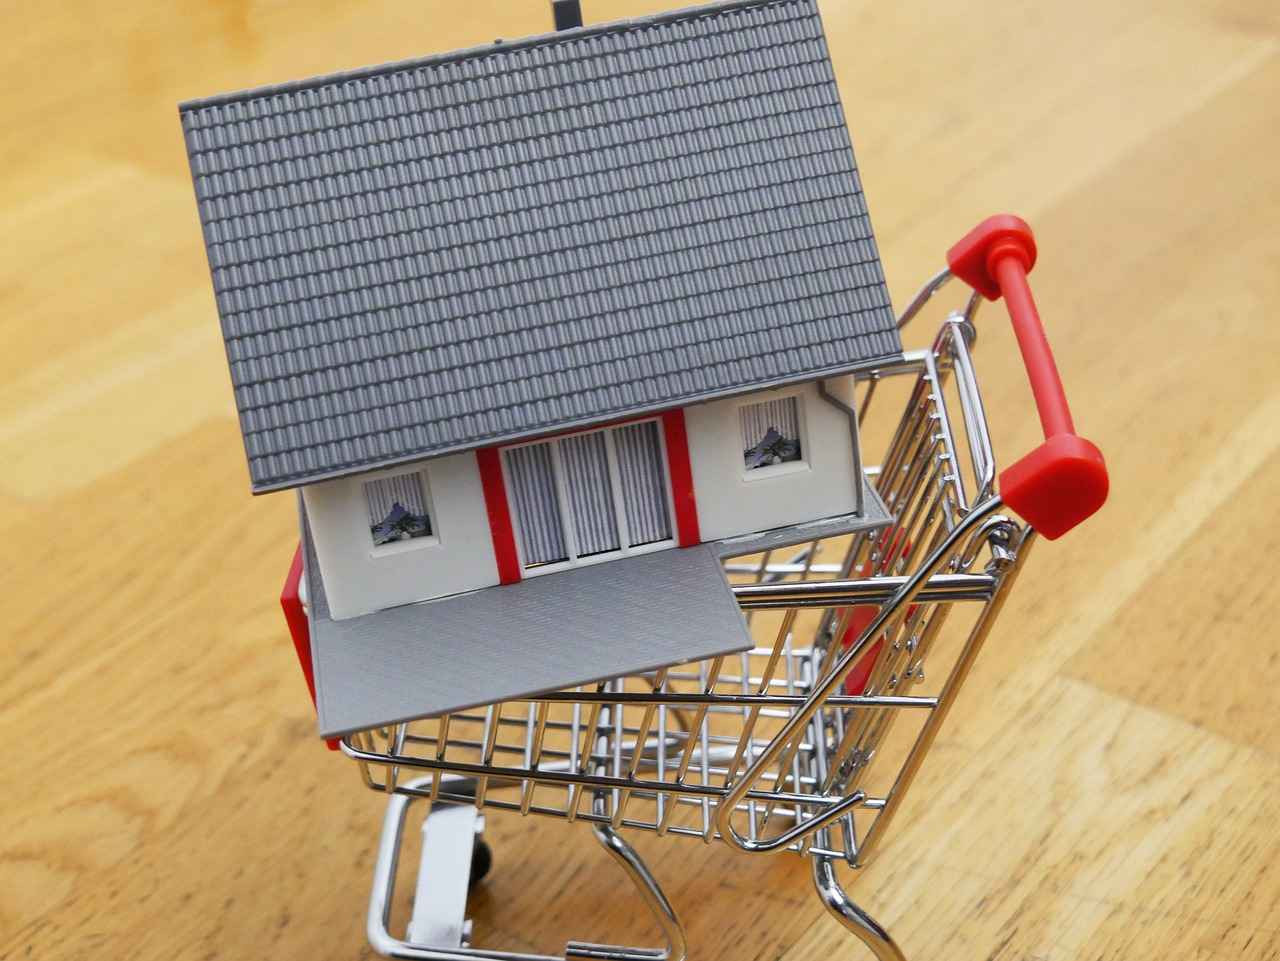 credito-a-la-vivienda-registra-tendencia-a-la-baja-bbva